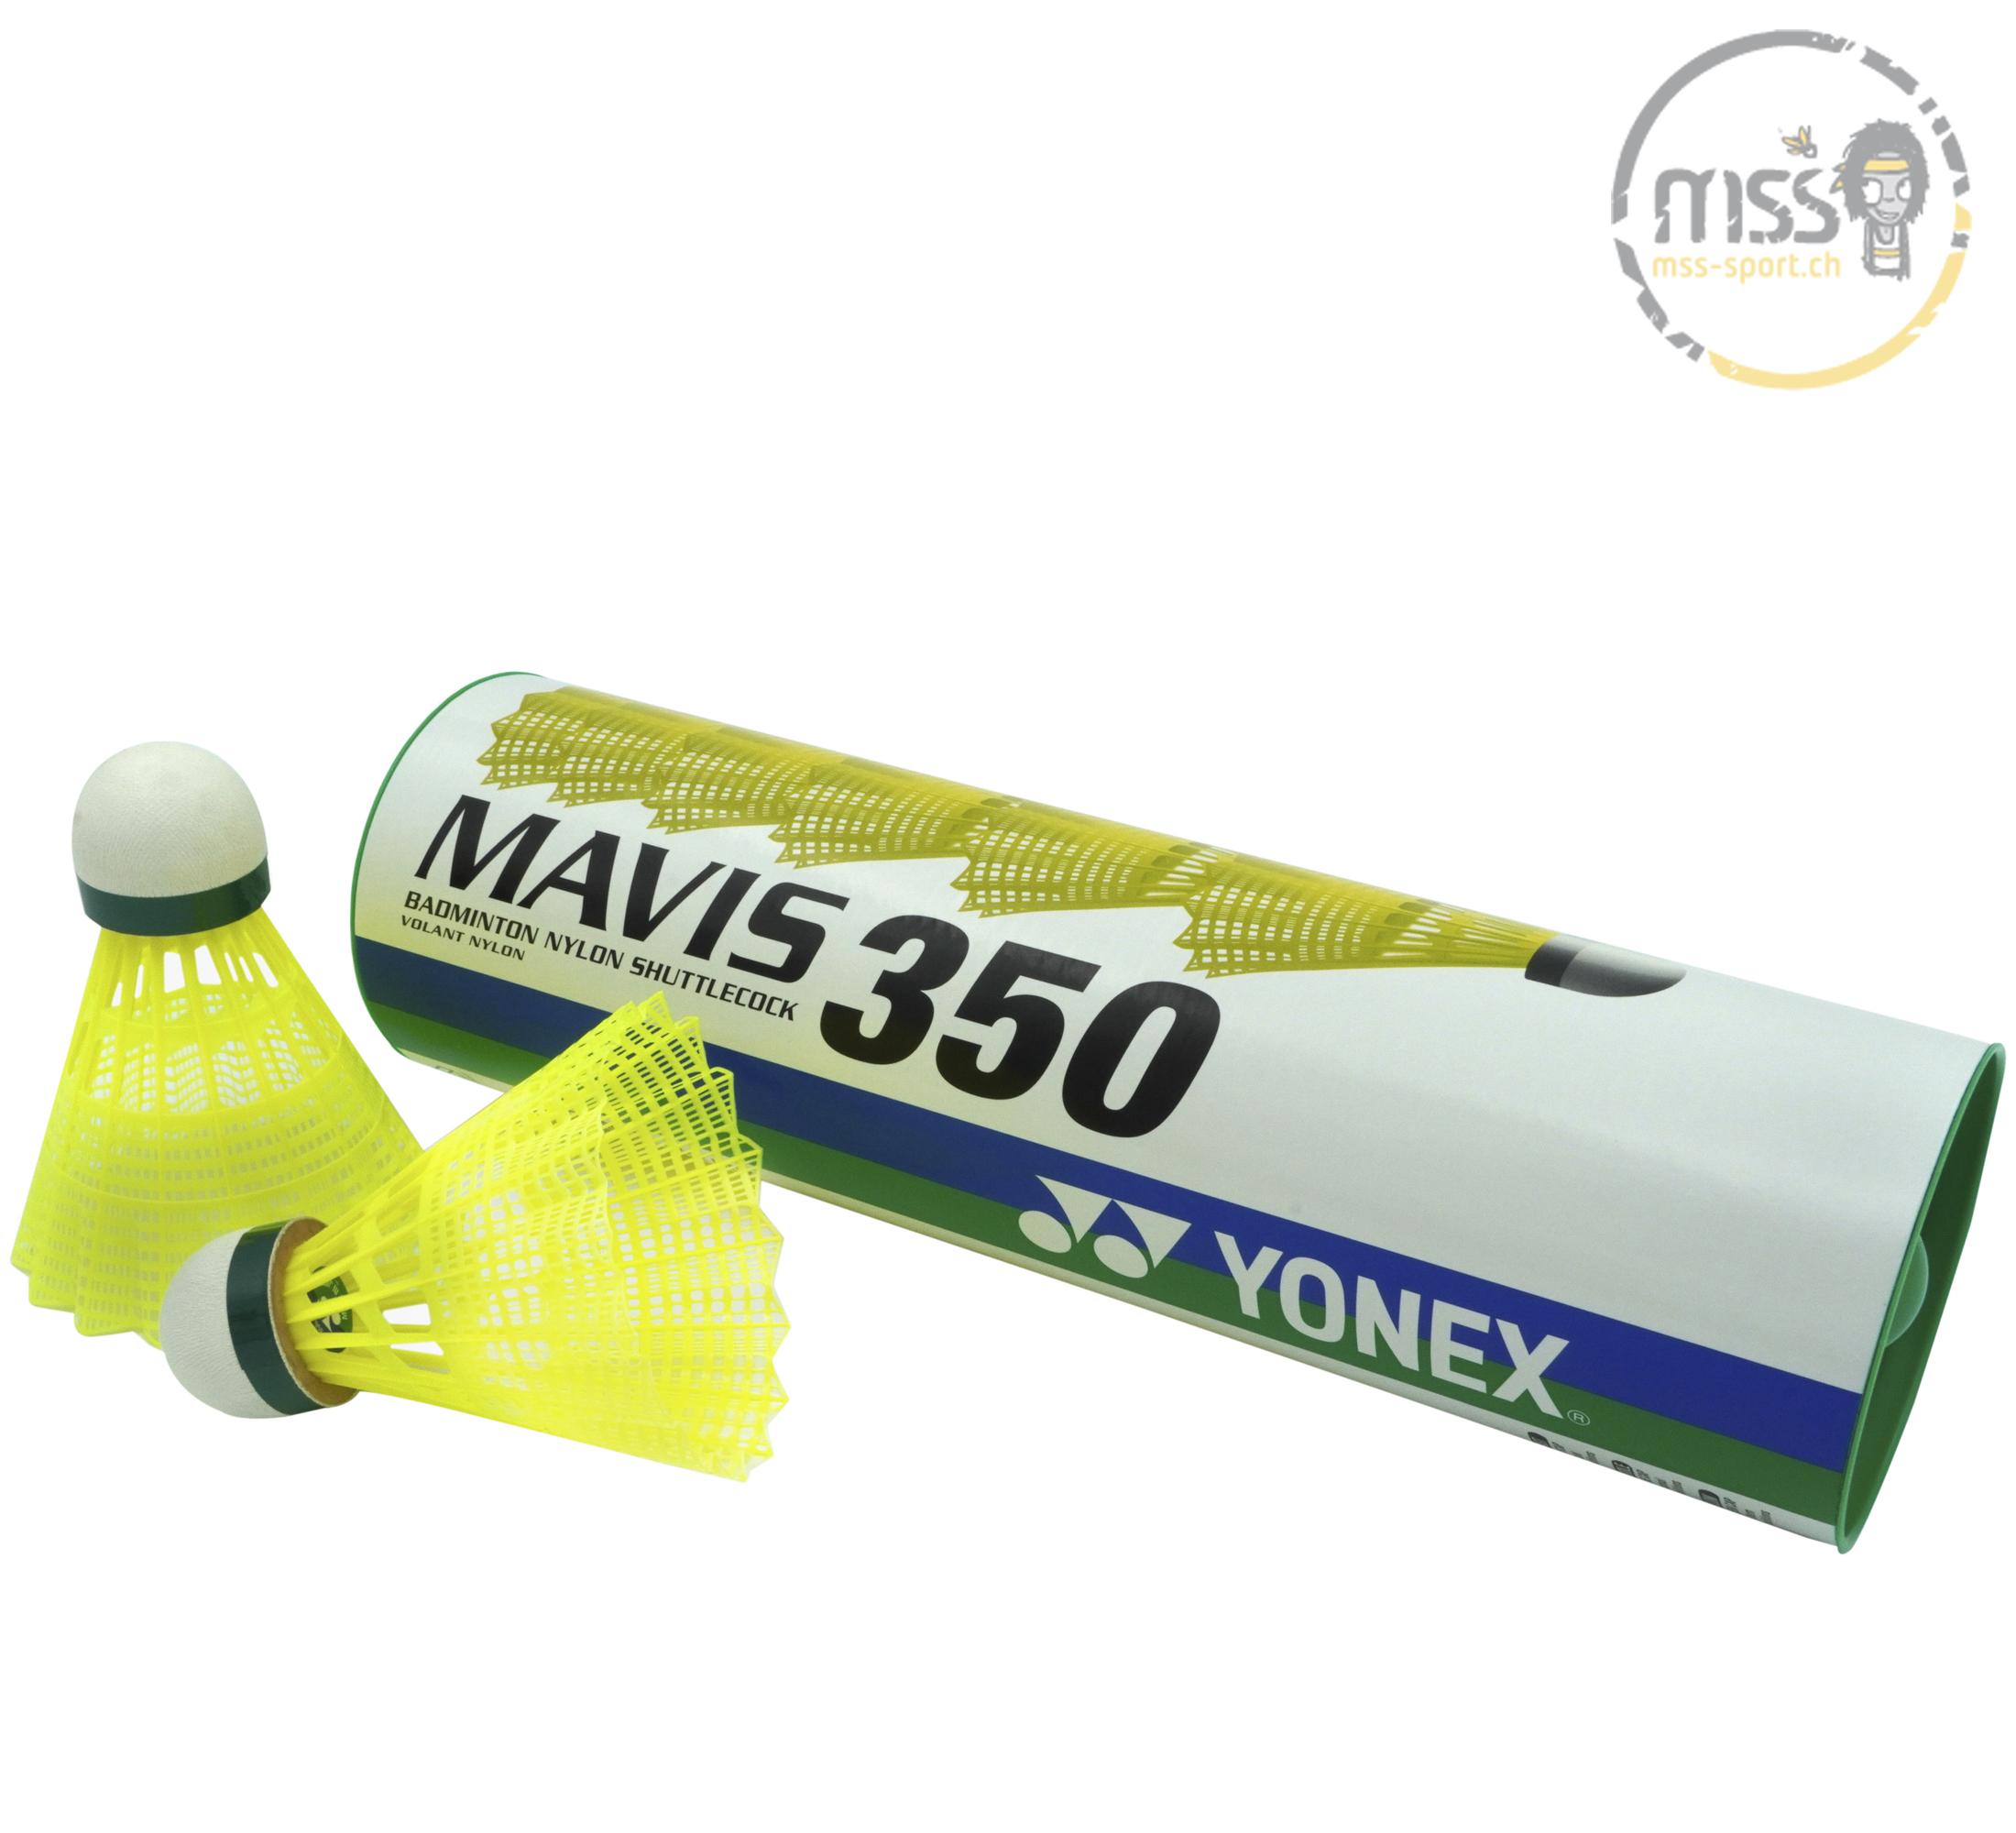 Yonex Mavis 350, yellow/green